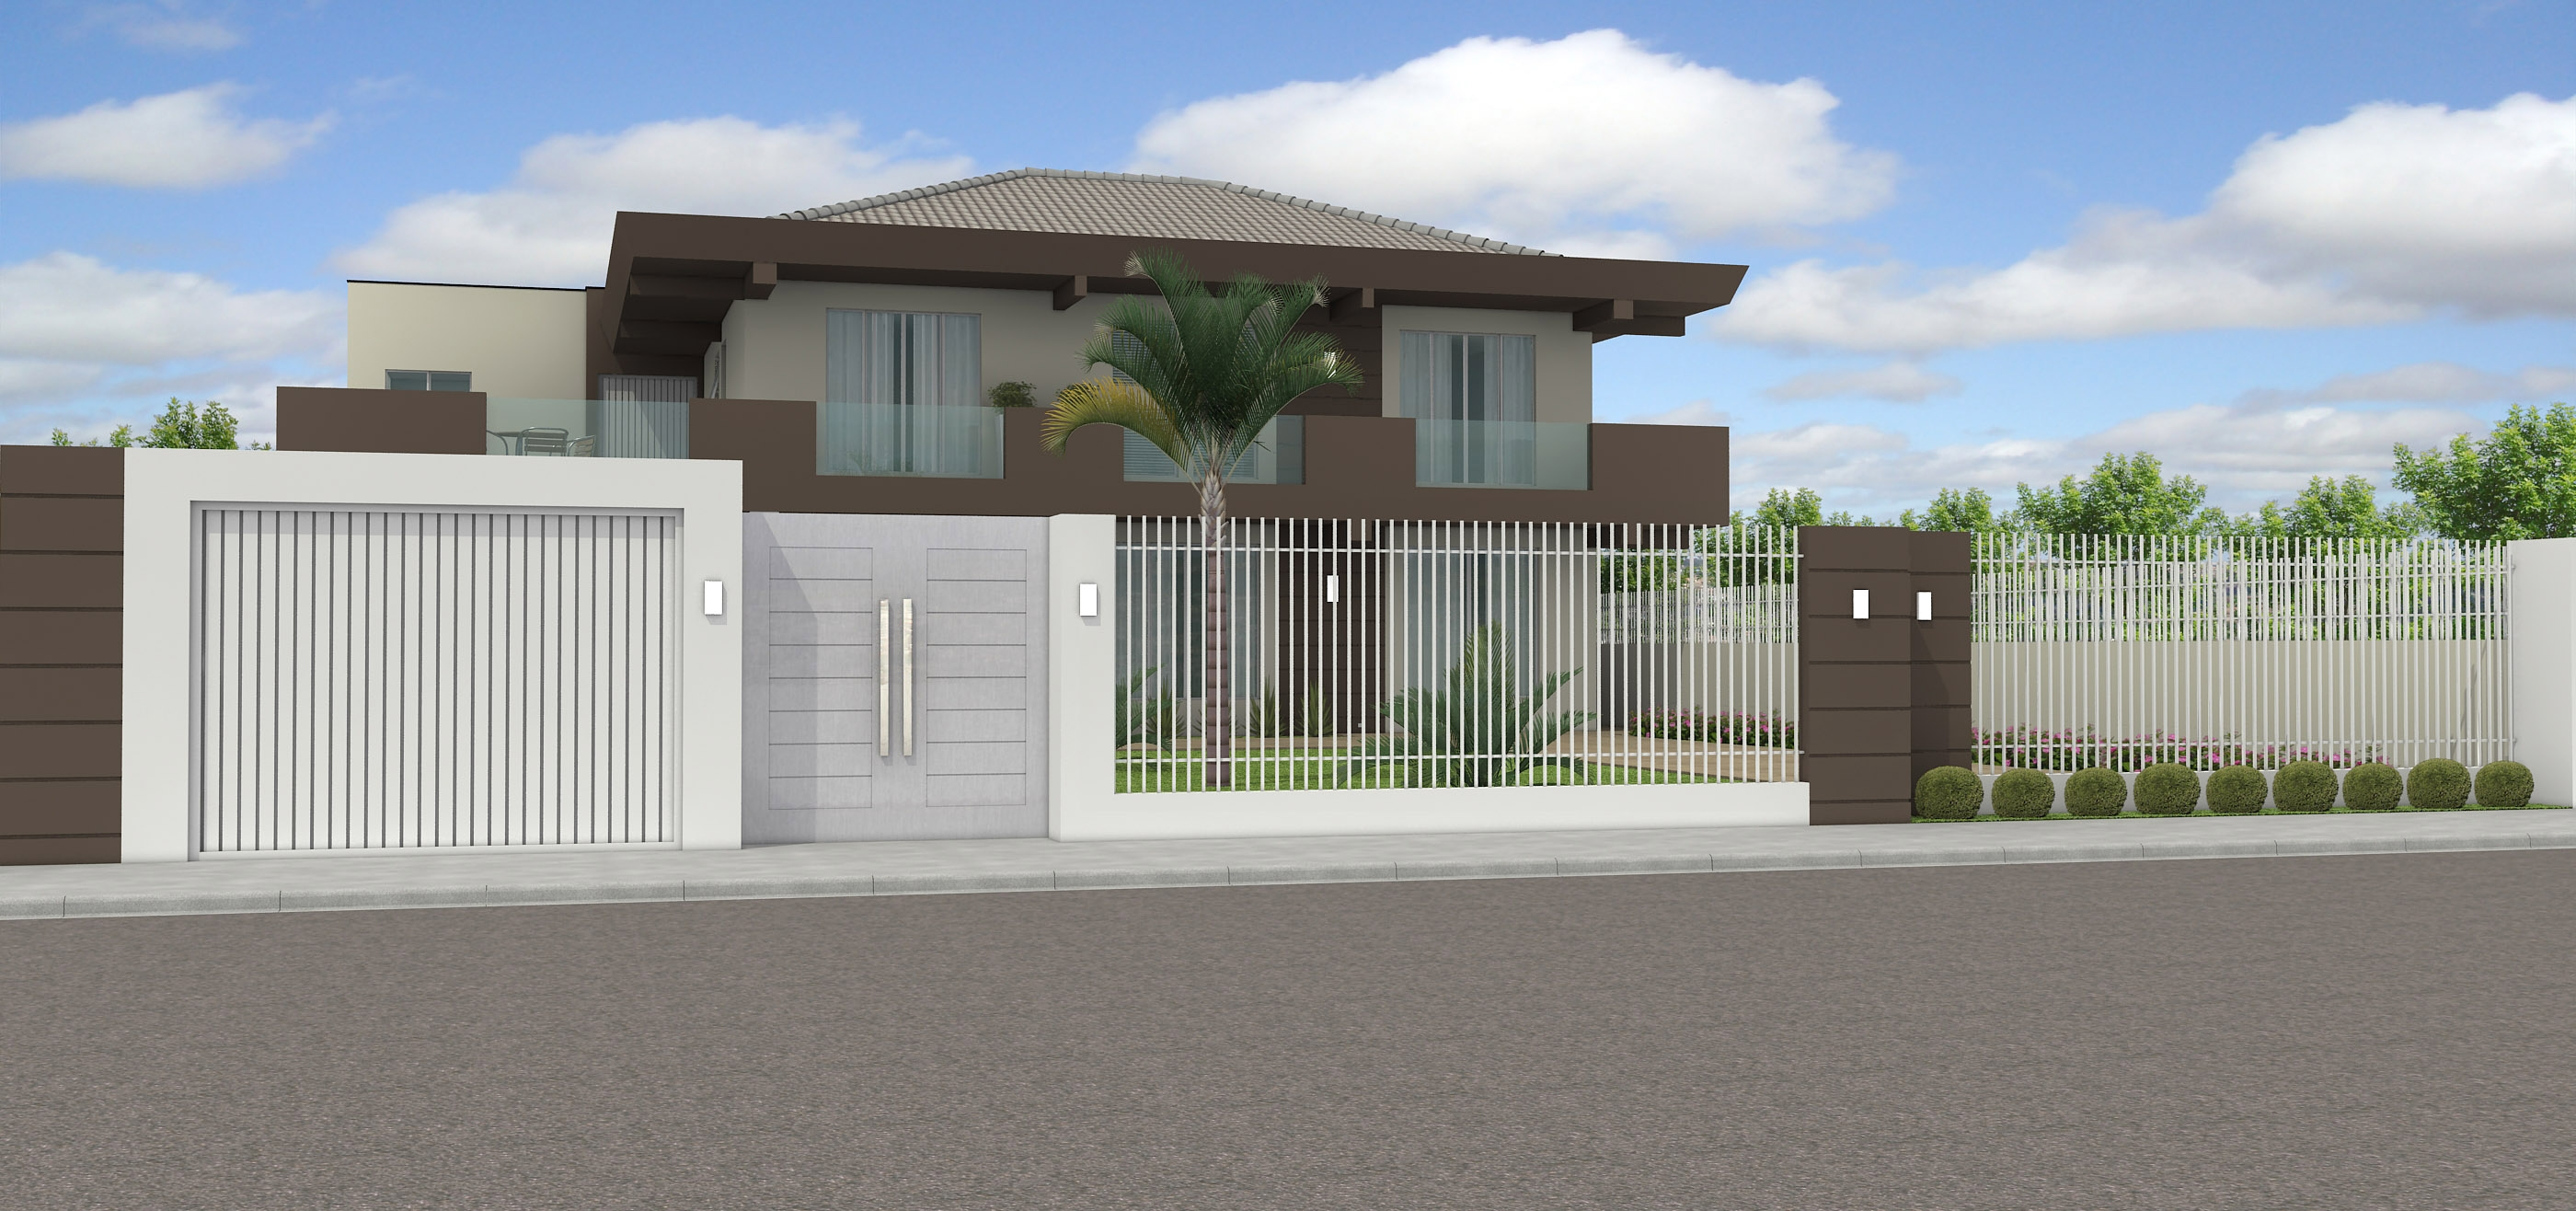 Port es de casas modernas 13 modelos para inspirar for Modelo de casa de 4x6